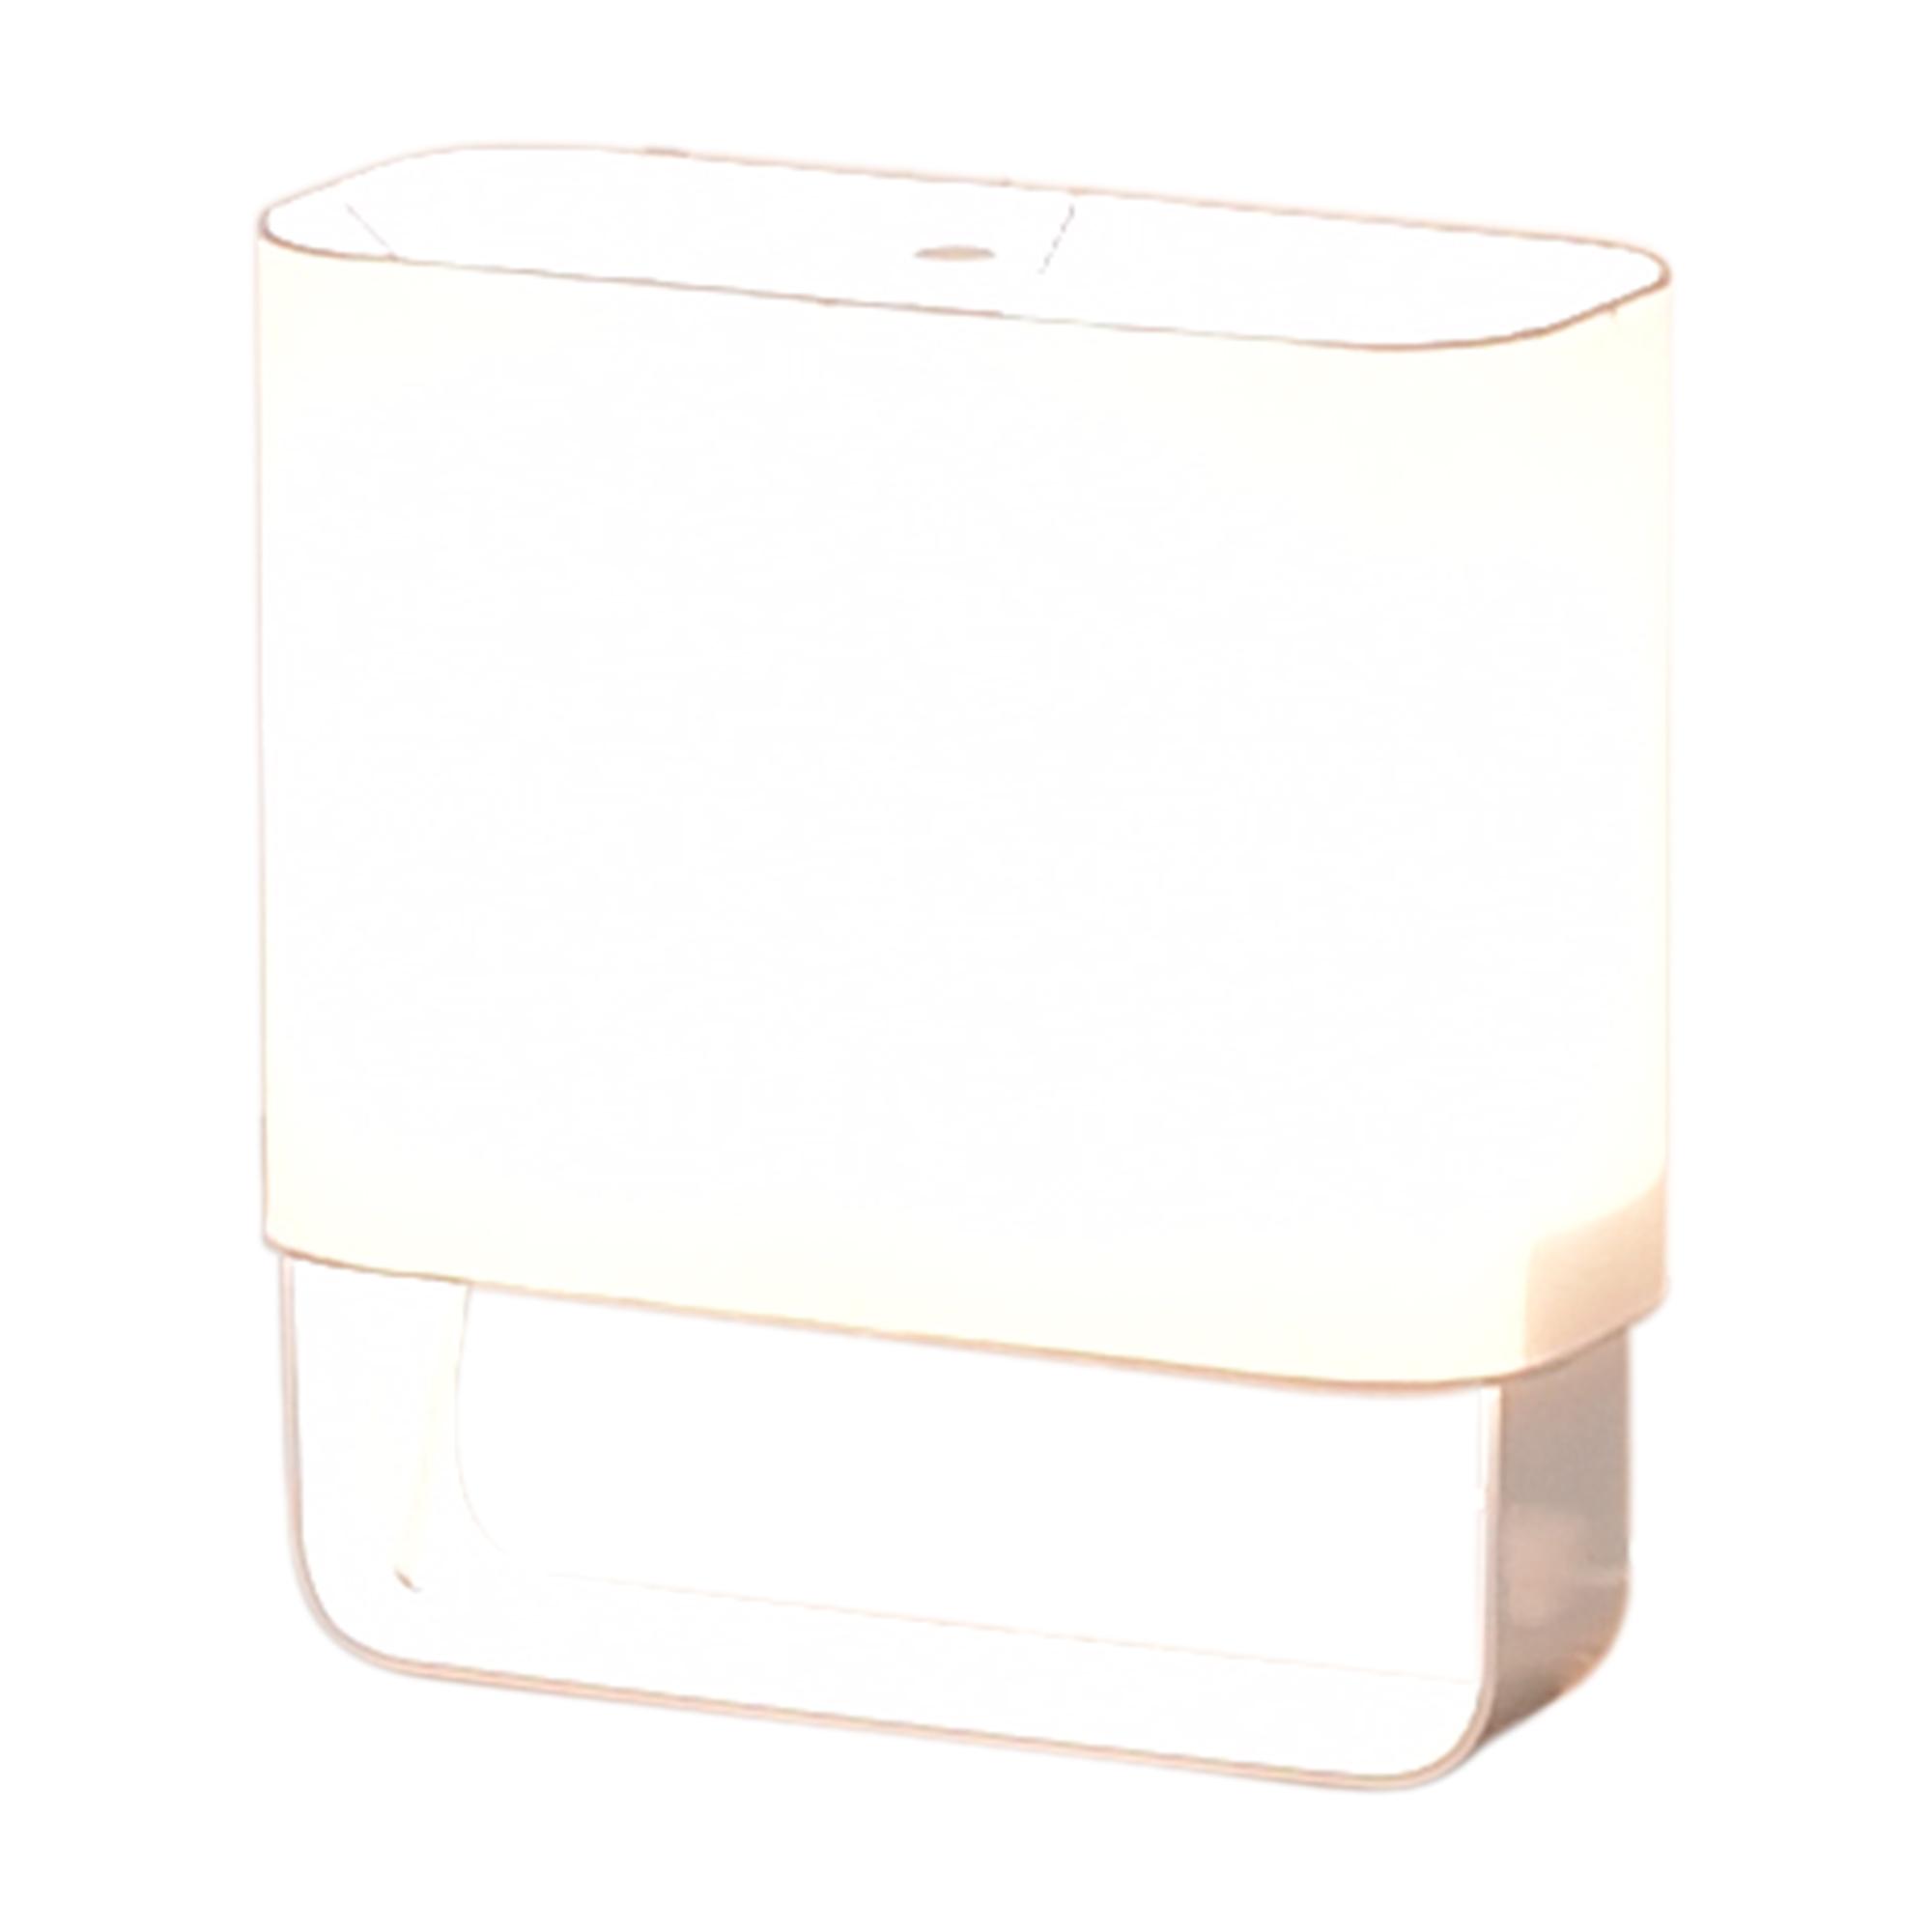 Room & Board Room & Board Duo Table Lamp dimensions